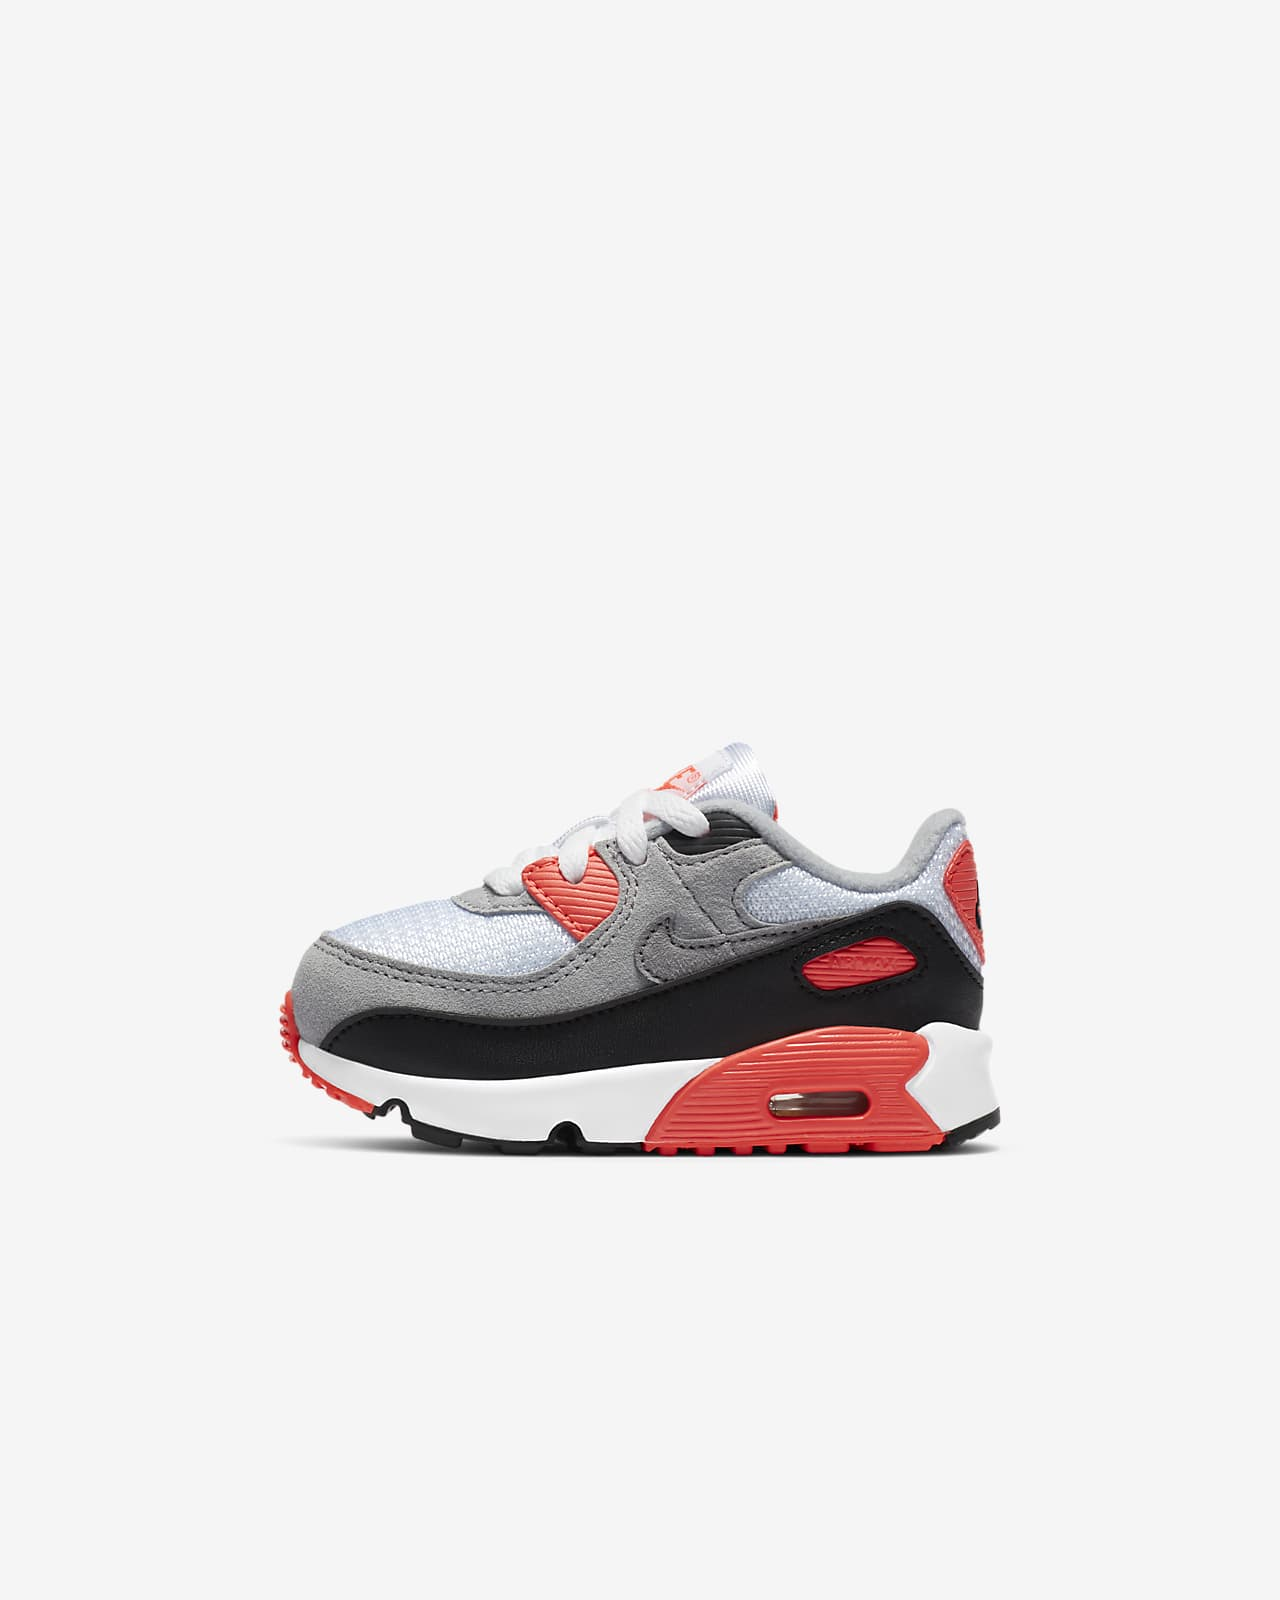 Nike Air Max 90 QS Baby/Toddler Shoe